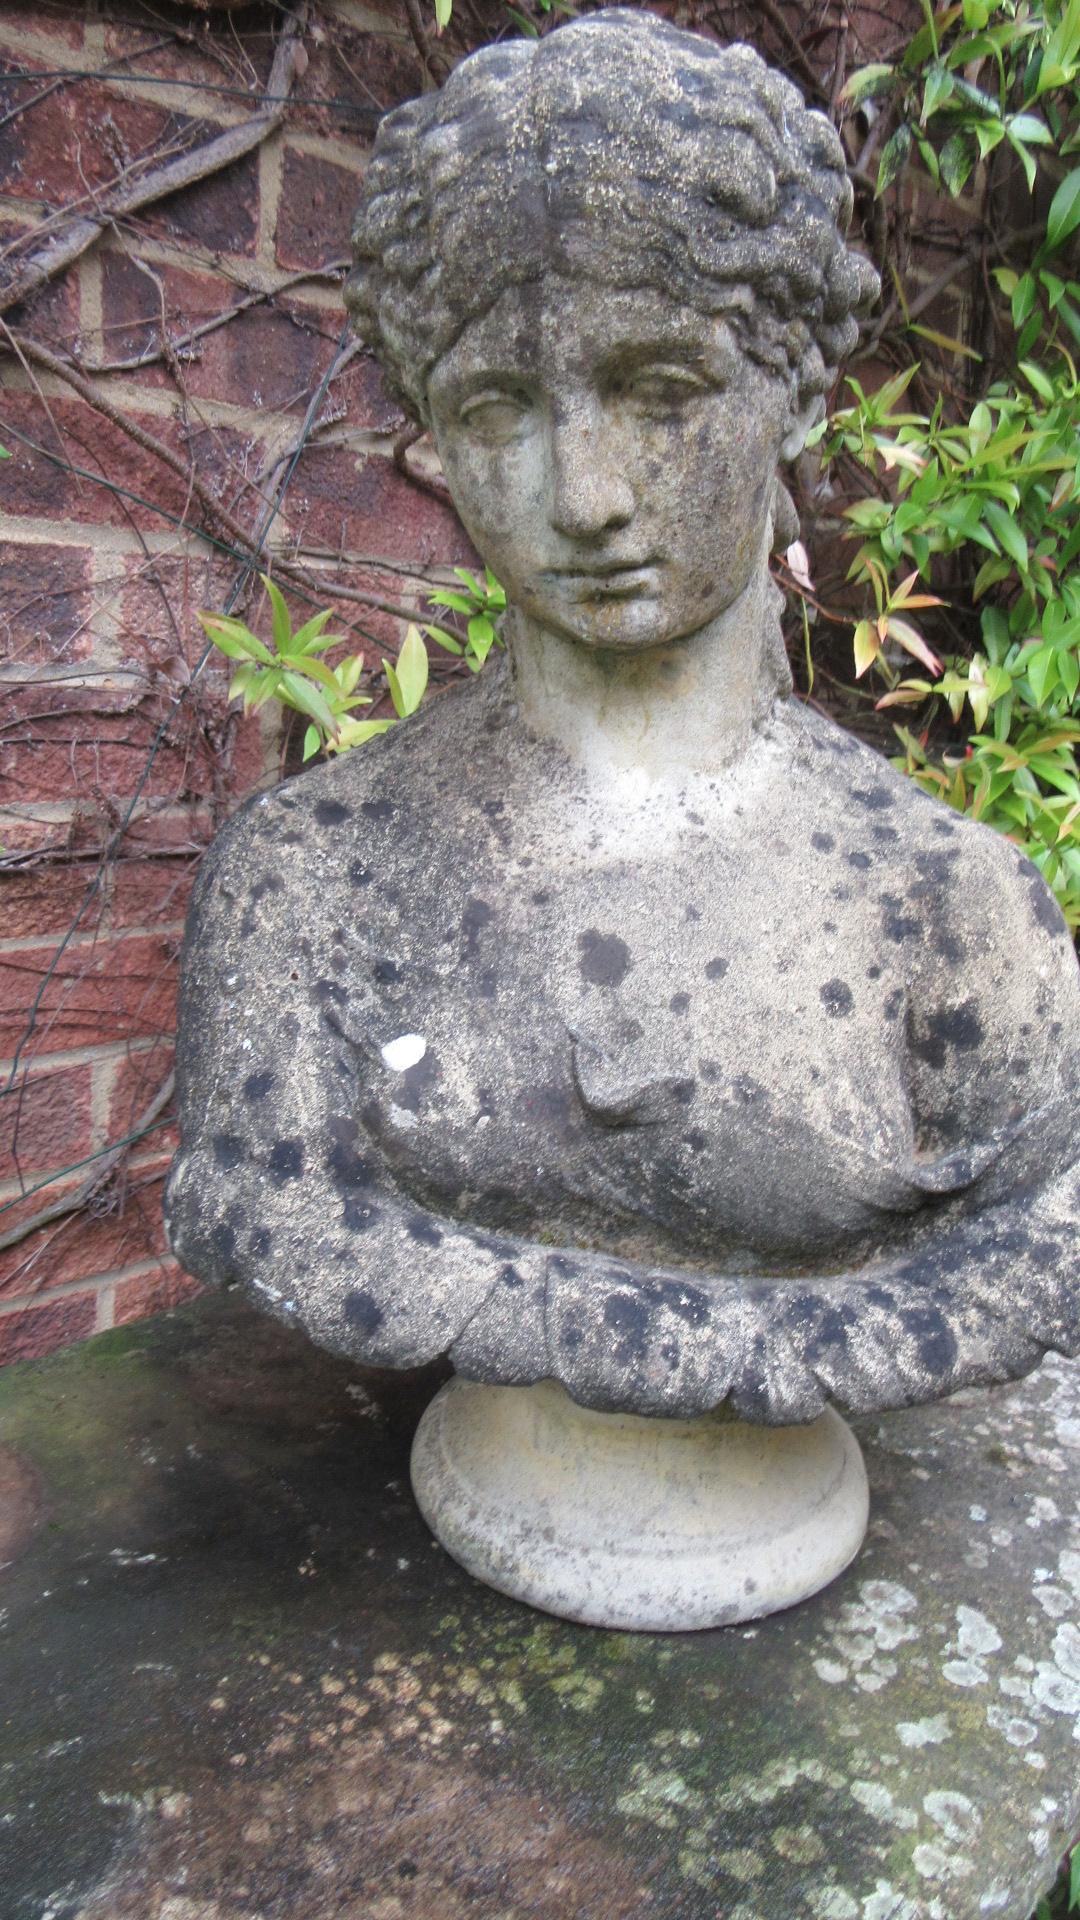 VINTAGE WEATHERED CONCRETE FEMALE GARDEN BUST